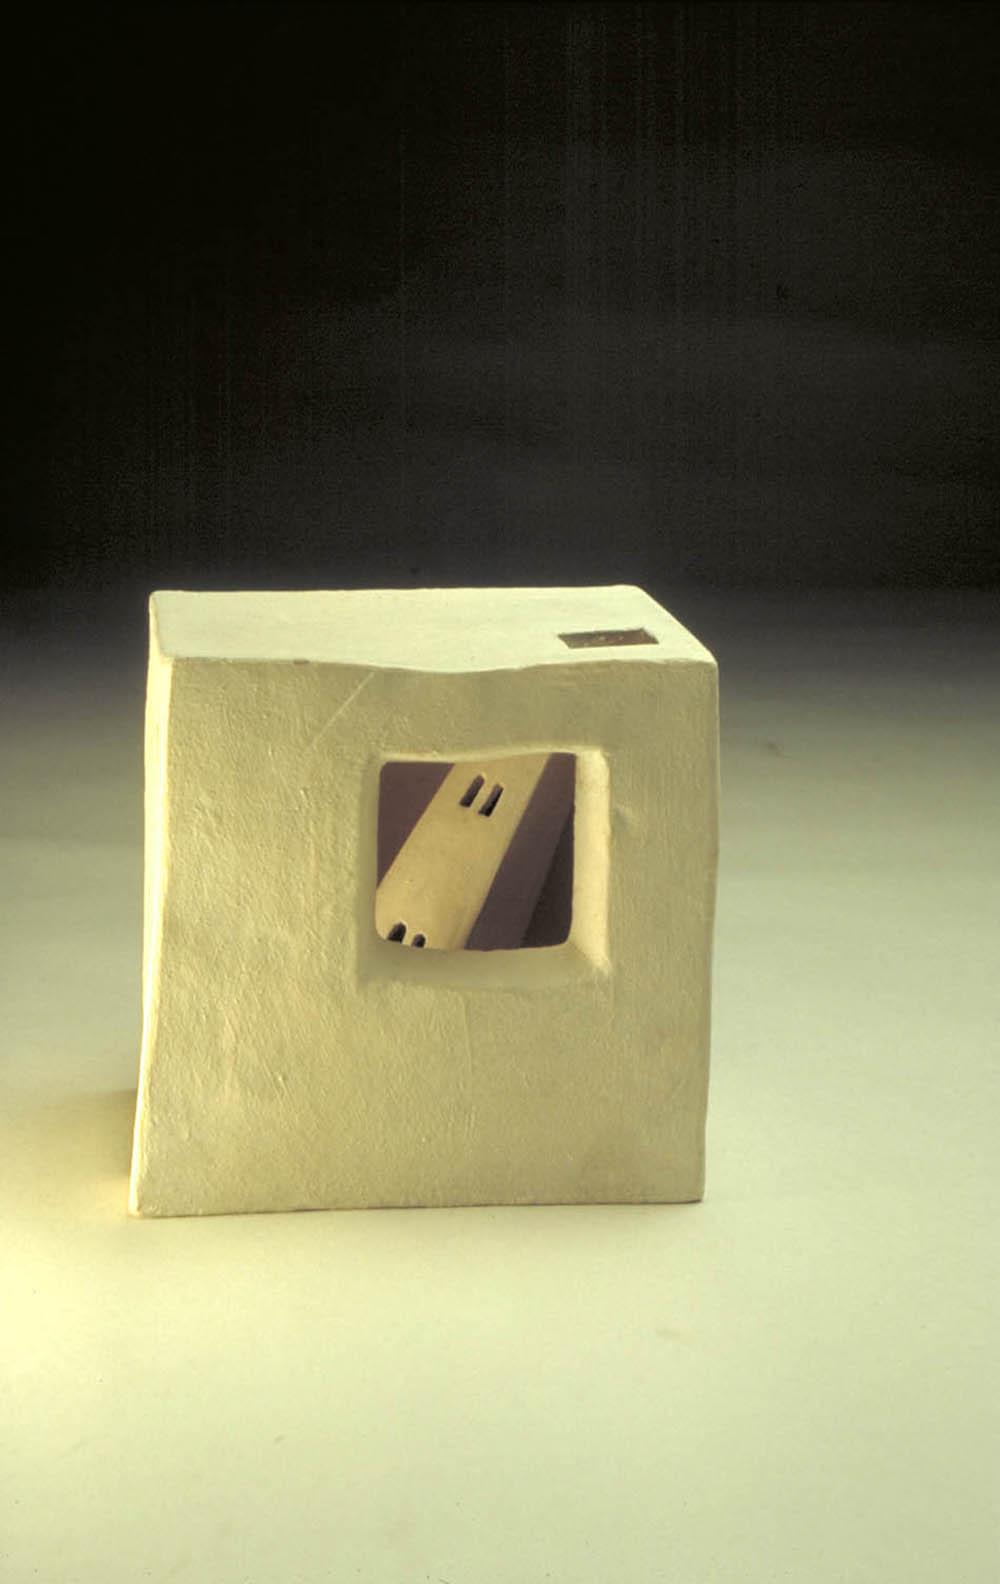 0025web-tower-in-box.jpg